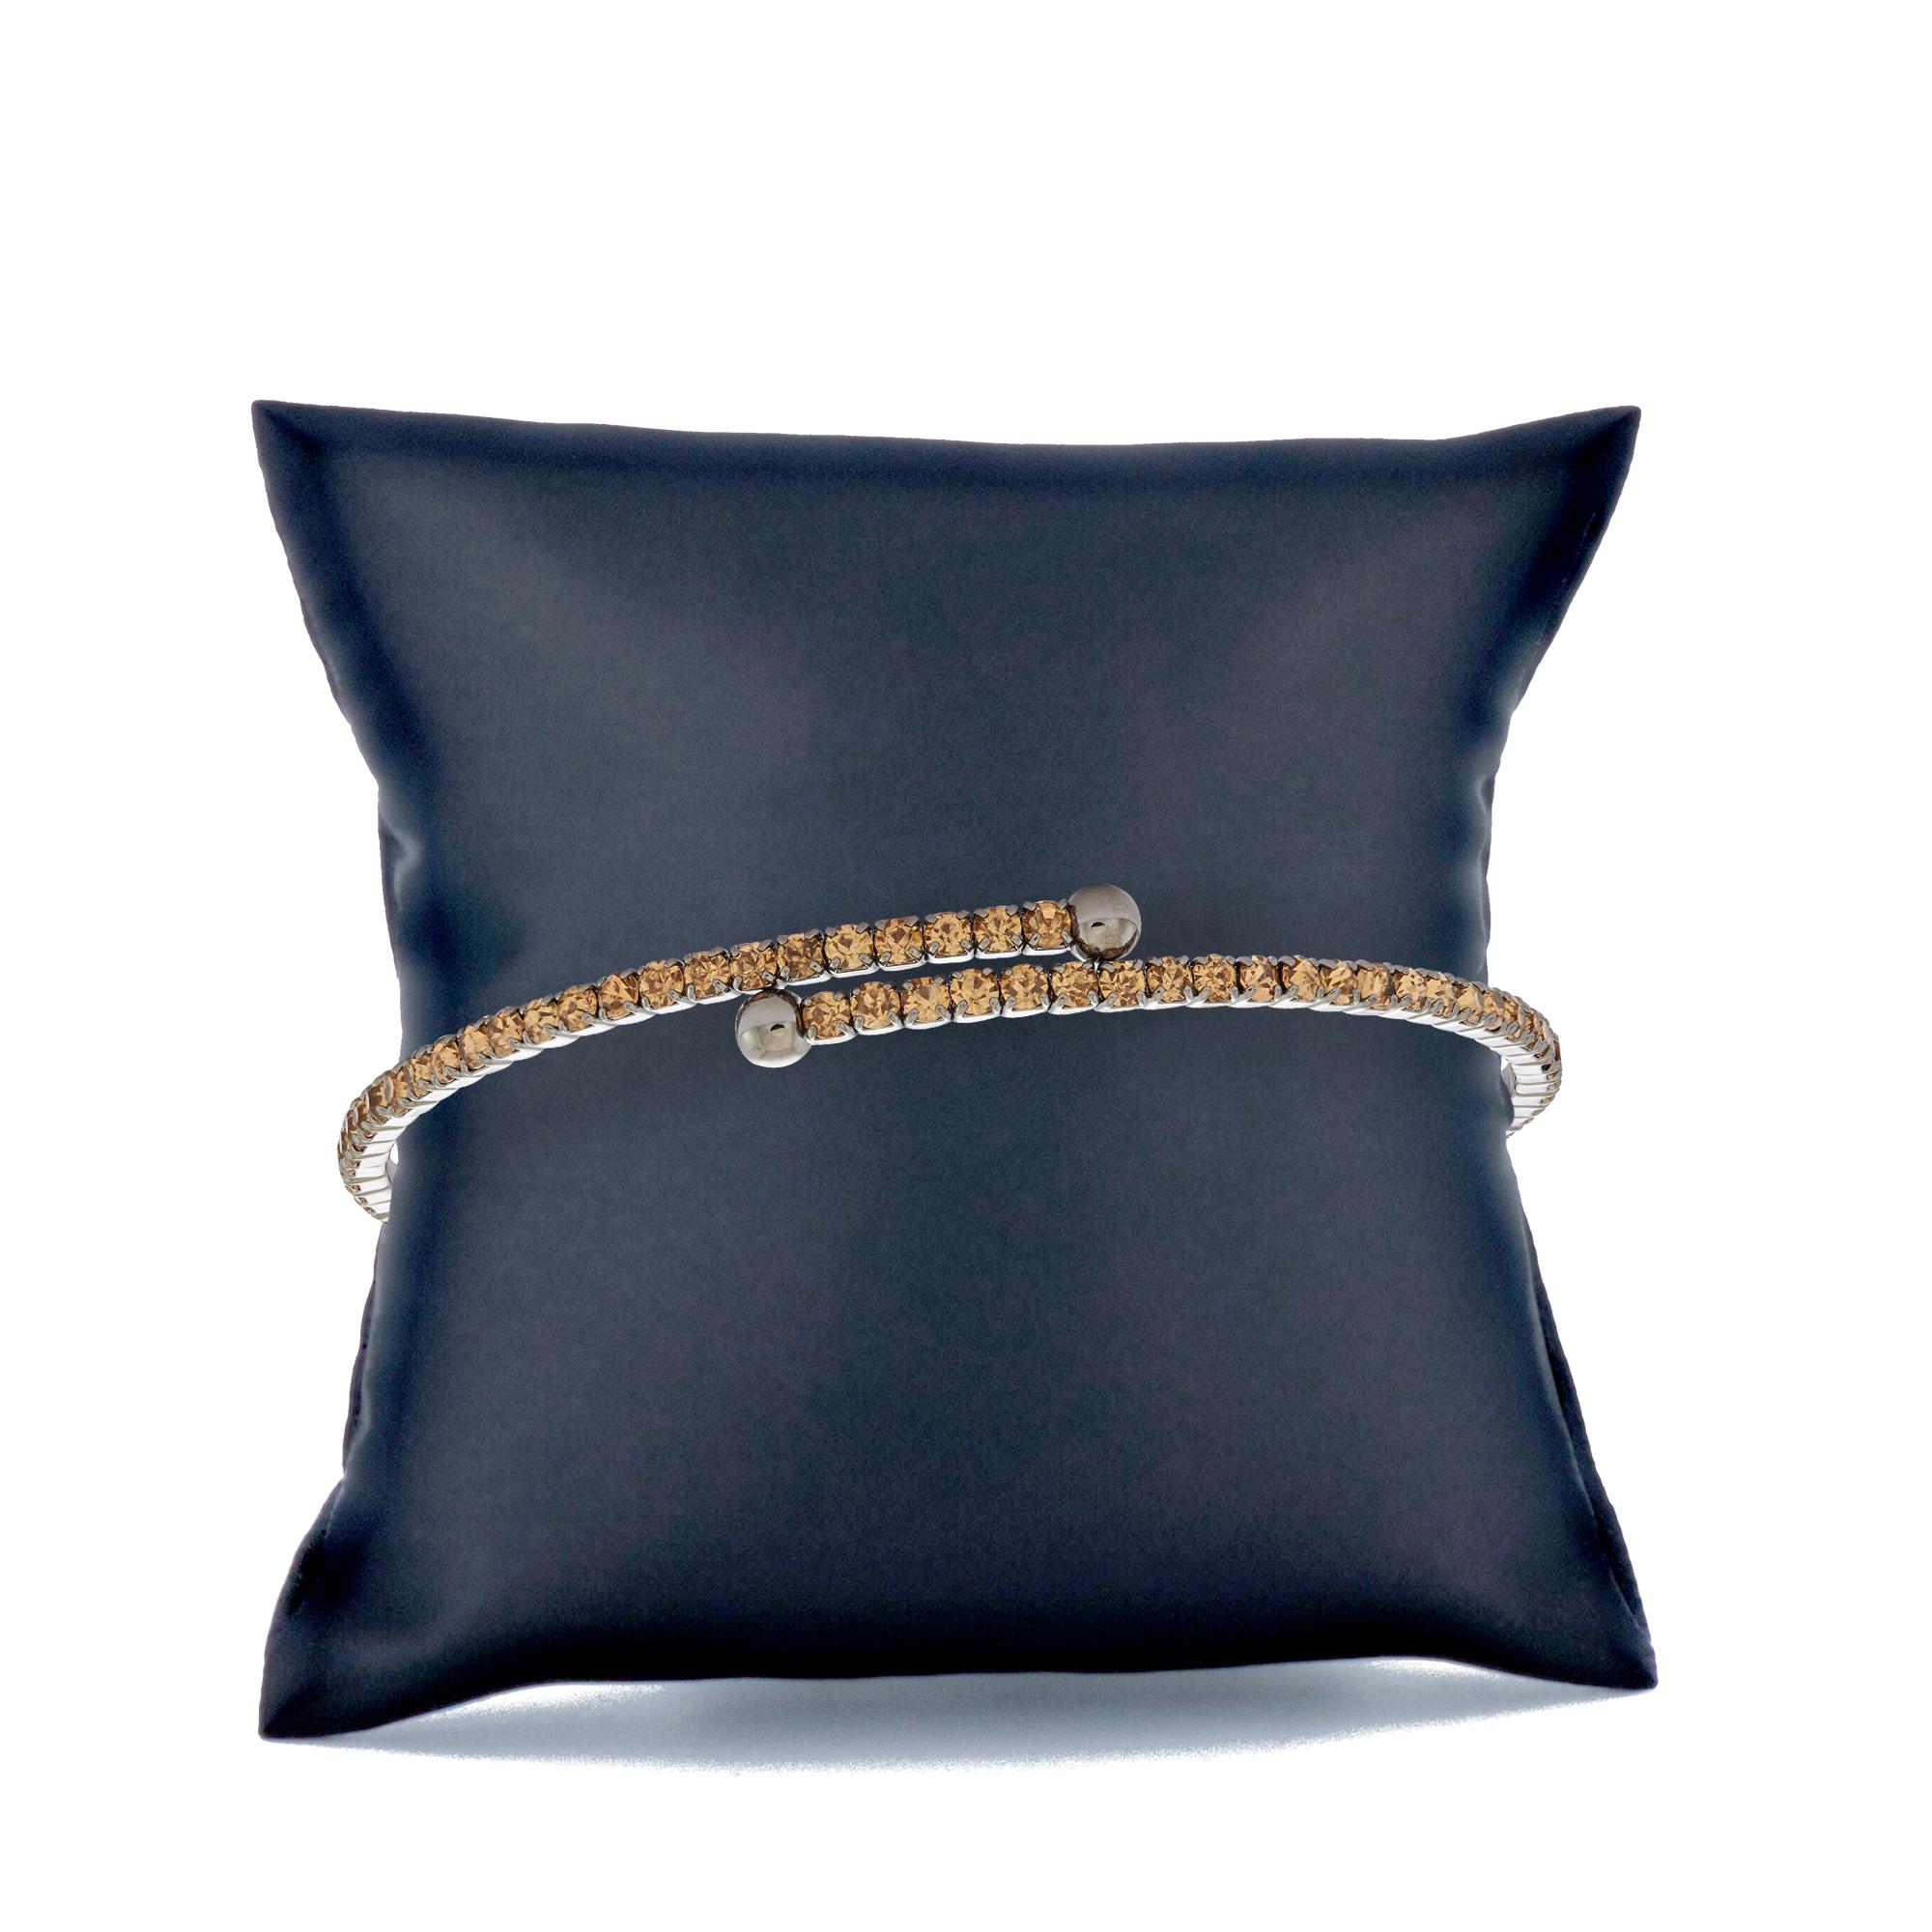 Womens-Ladies-Fashion-Accessories-Jewelry-Black-Rhodium-Plated-Bangle-Bracelet thumbnail 25